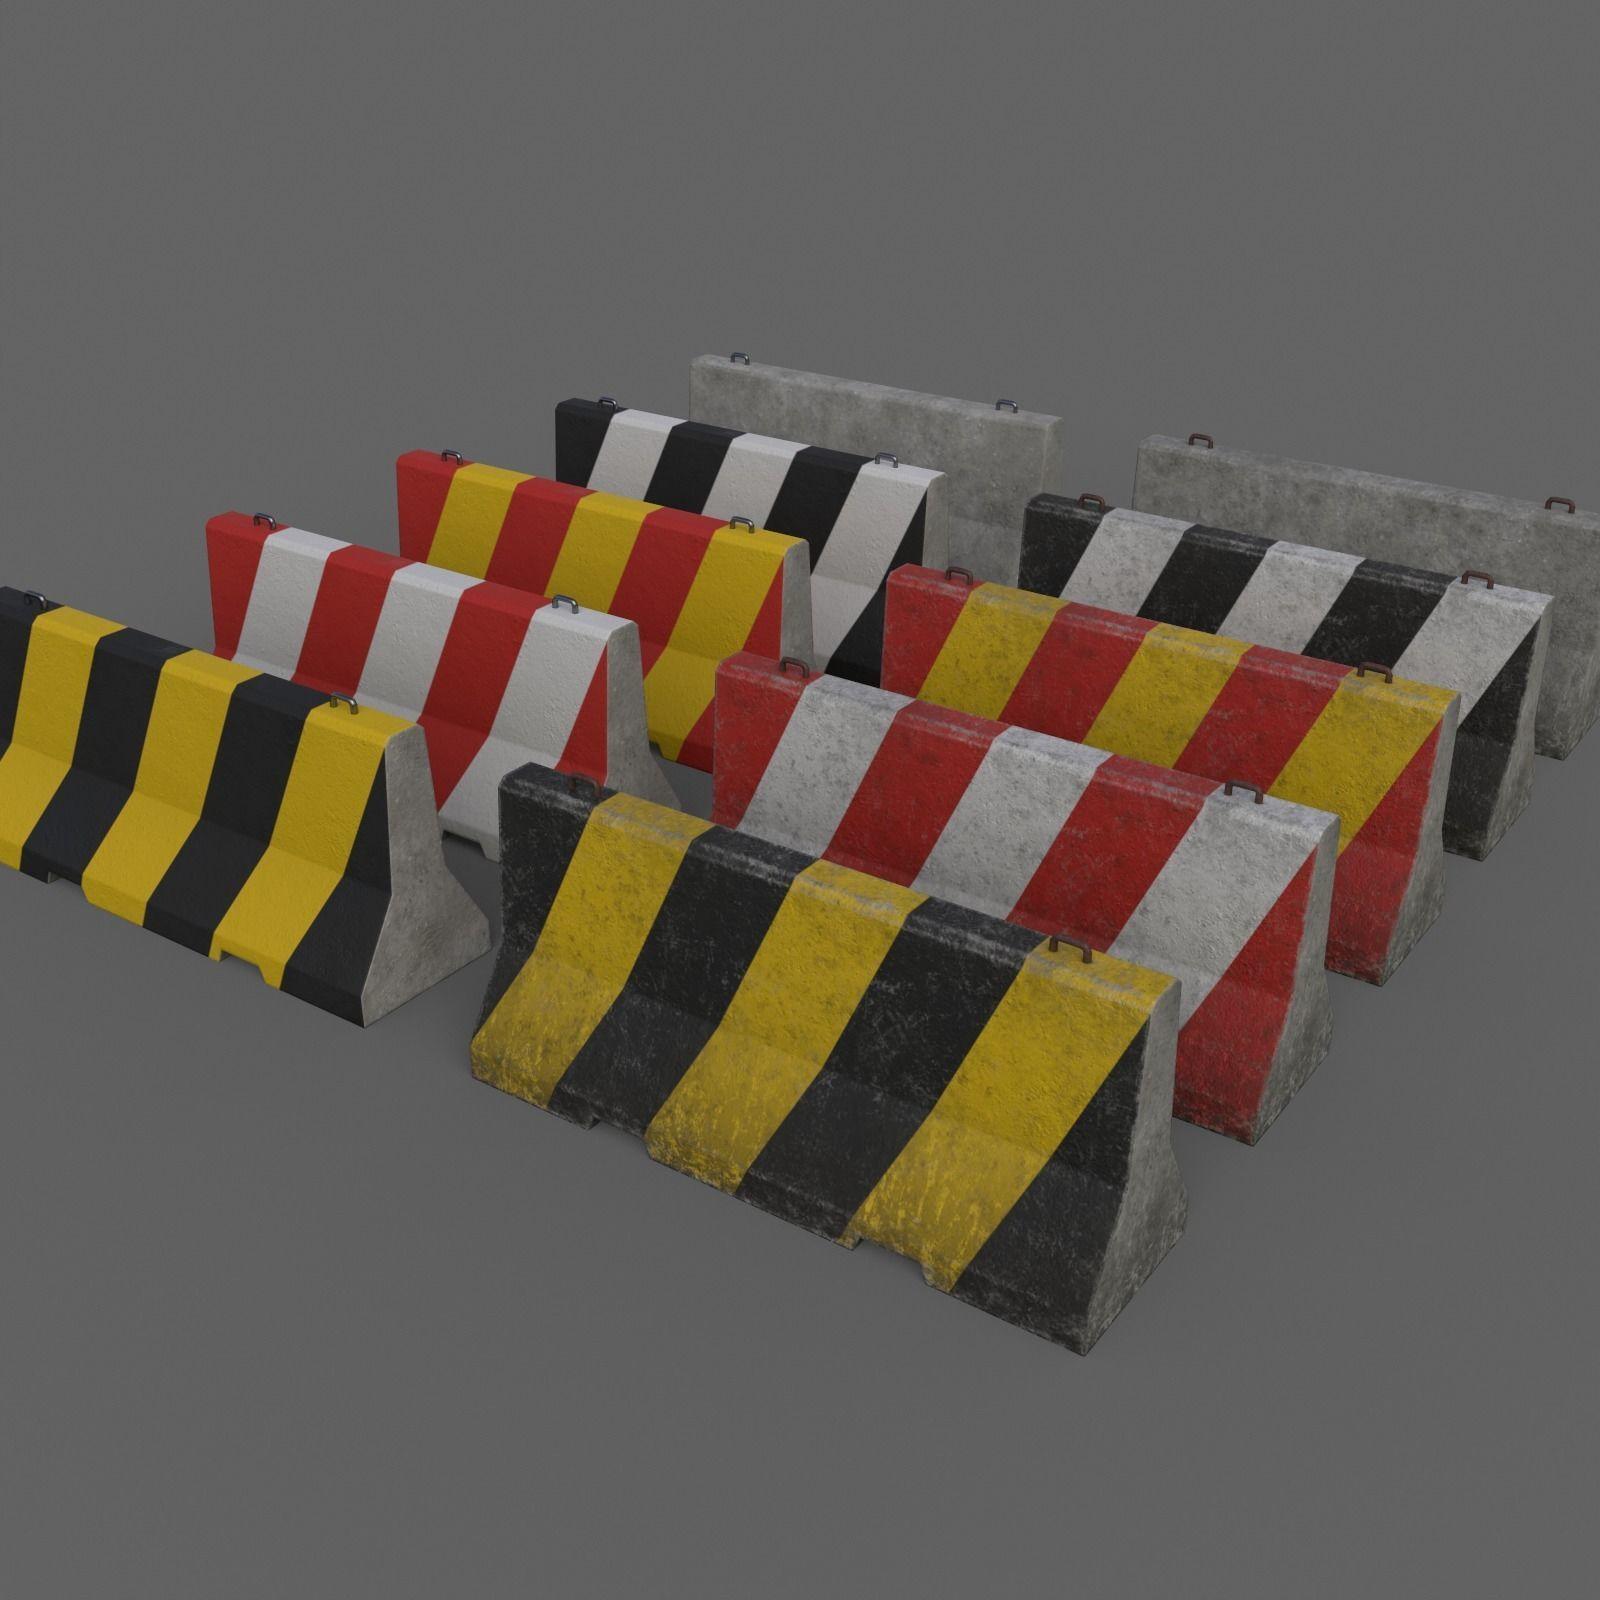 PBR Concrete Barrier V1